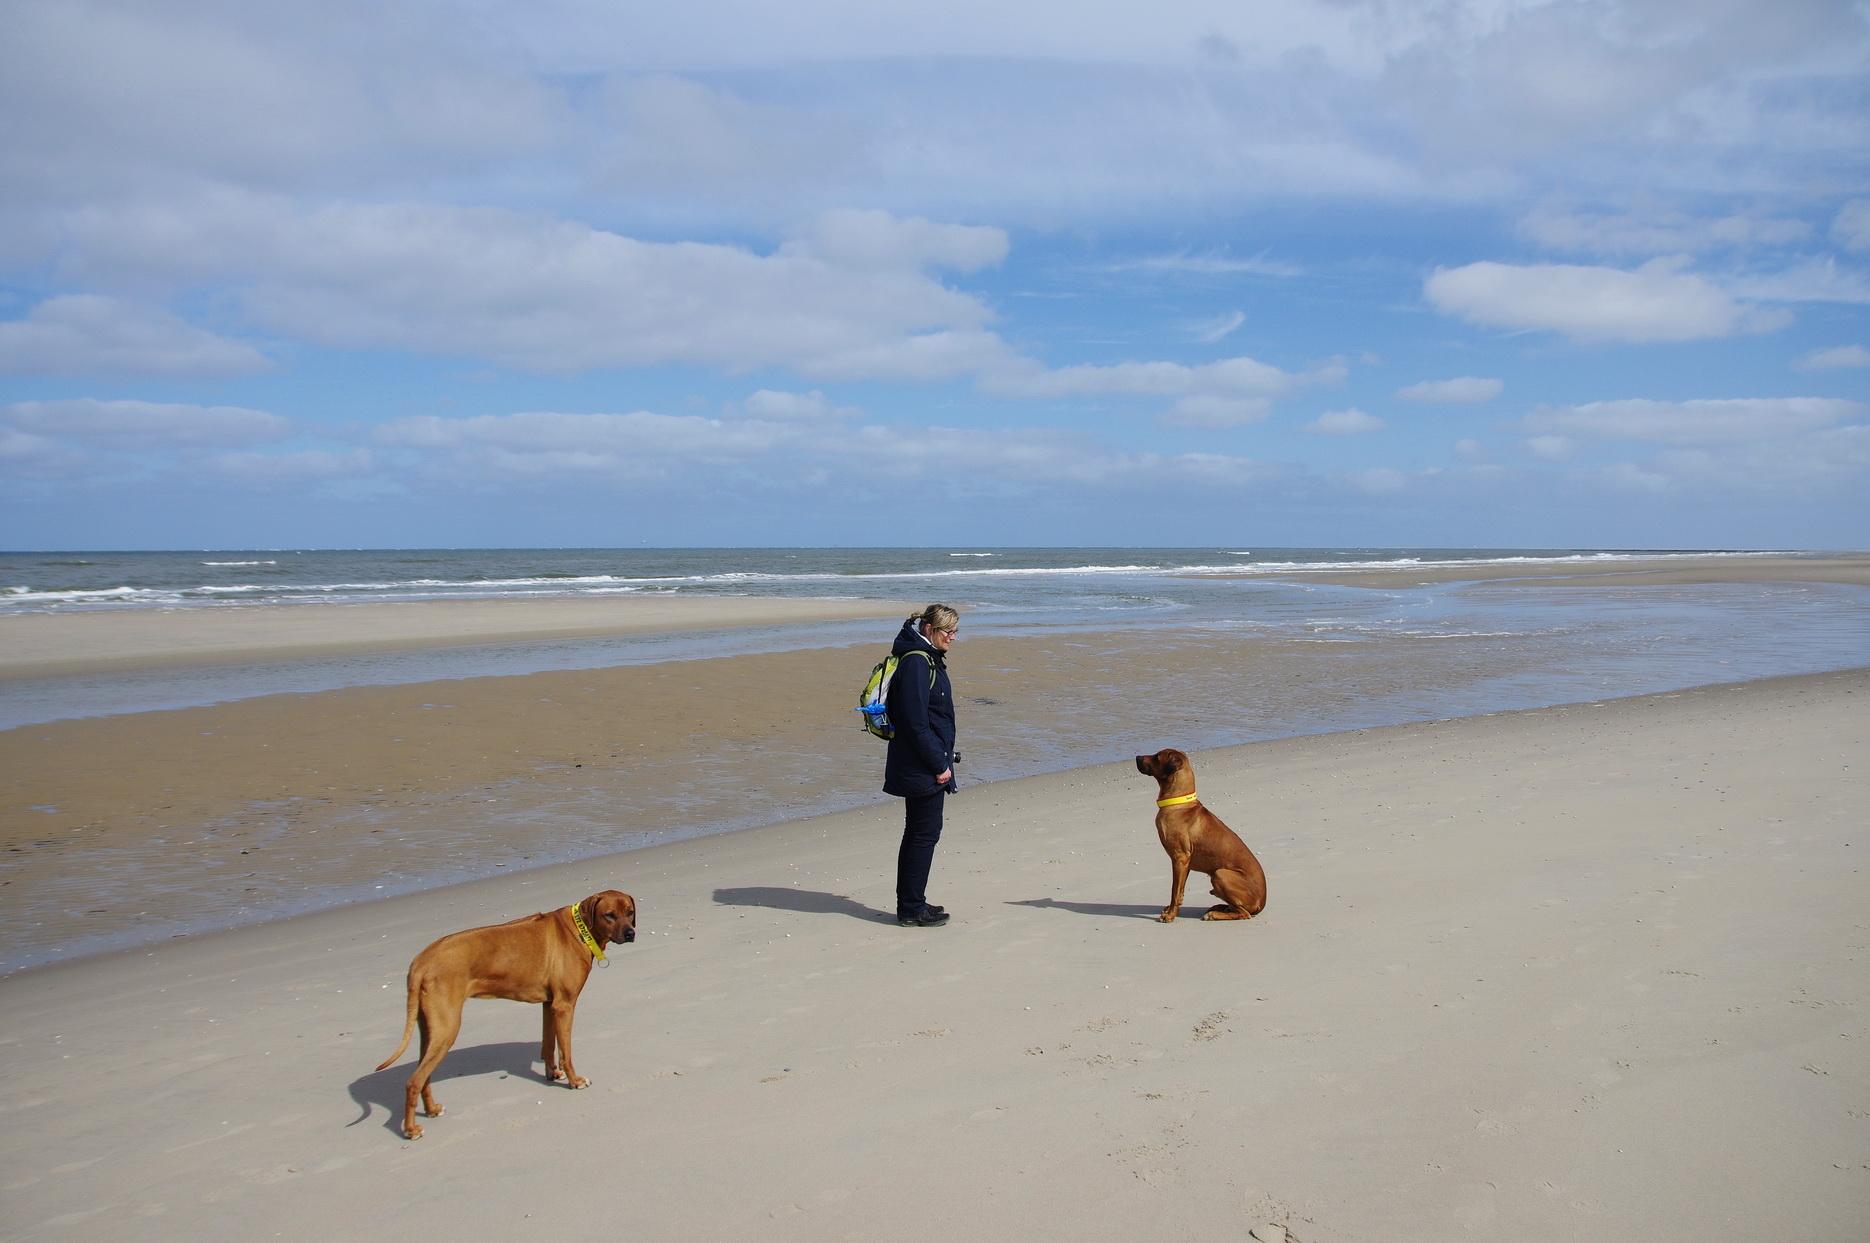 Texel - Strandspaziergang Leuchtturm TH 1